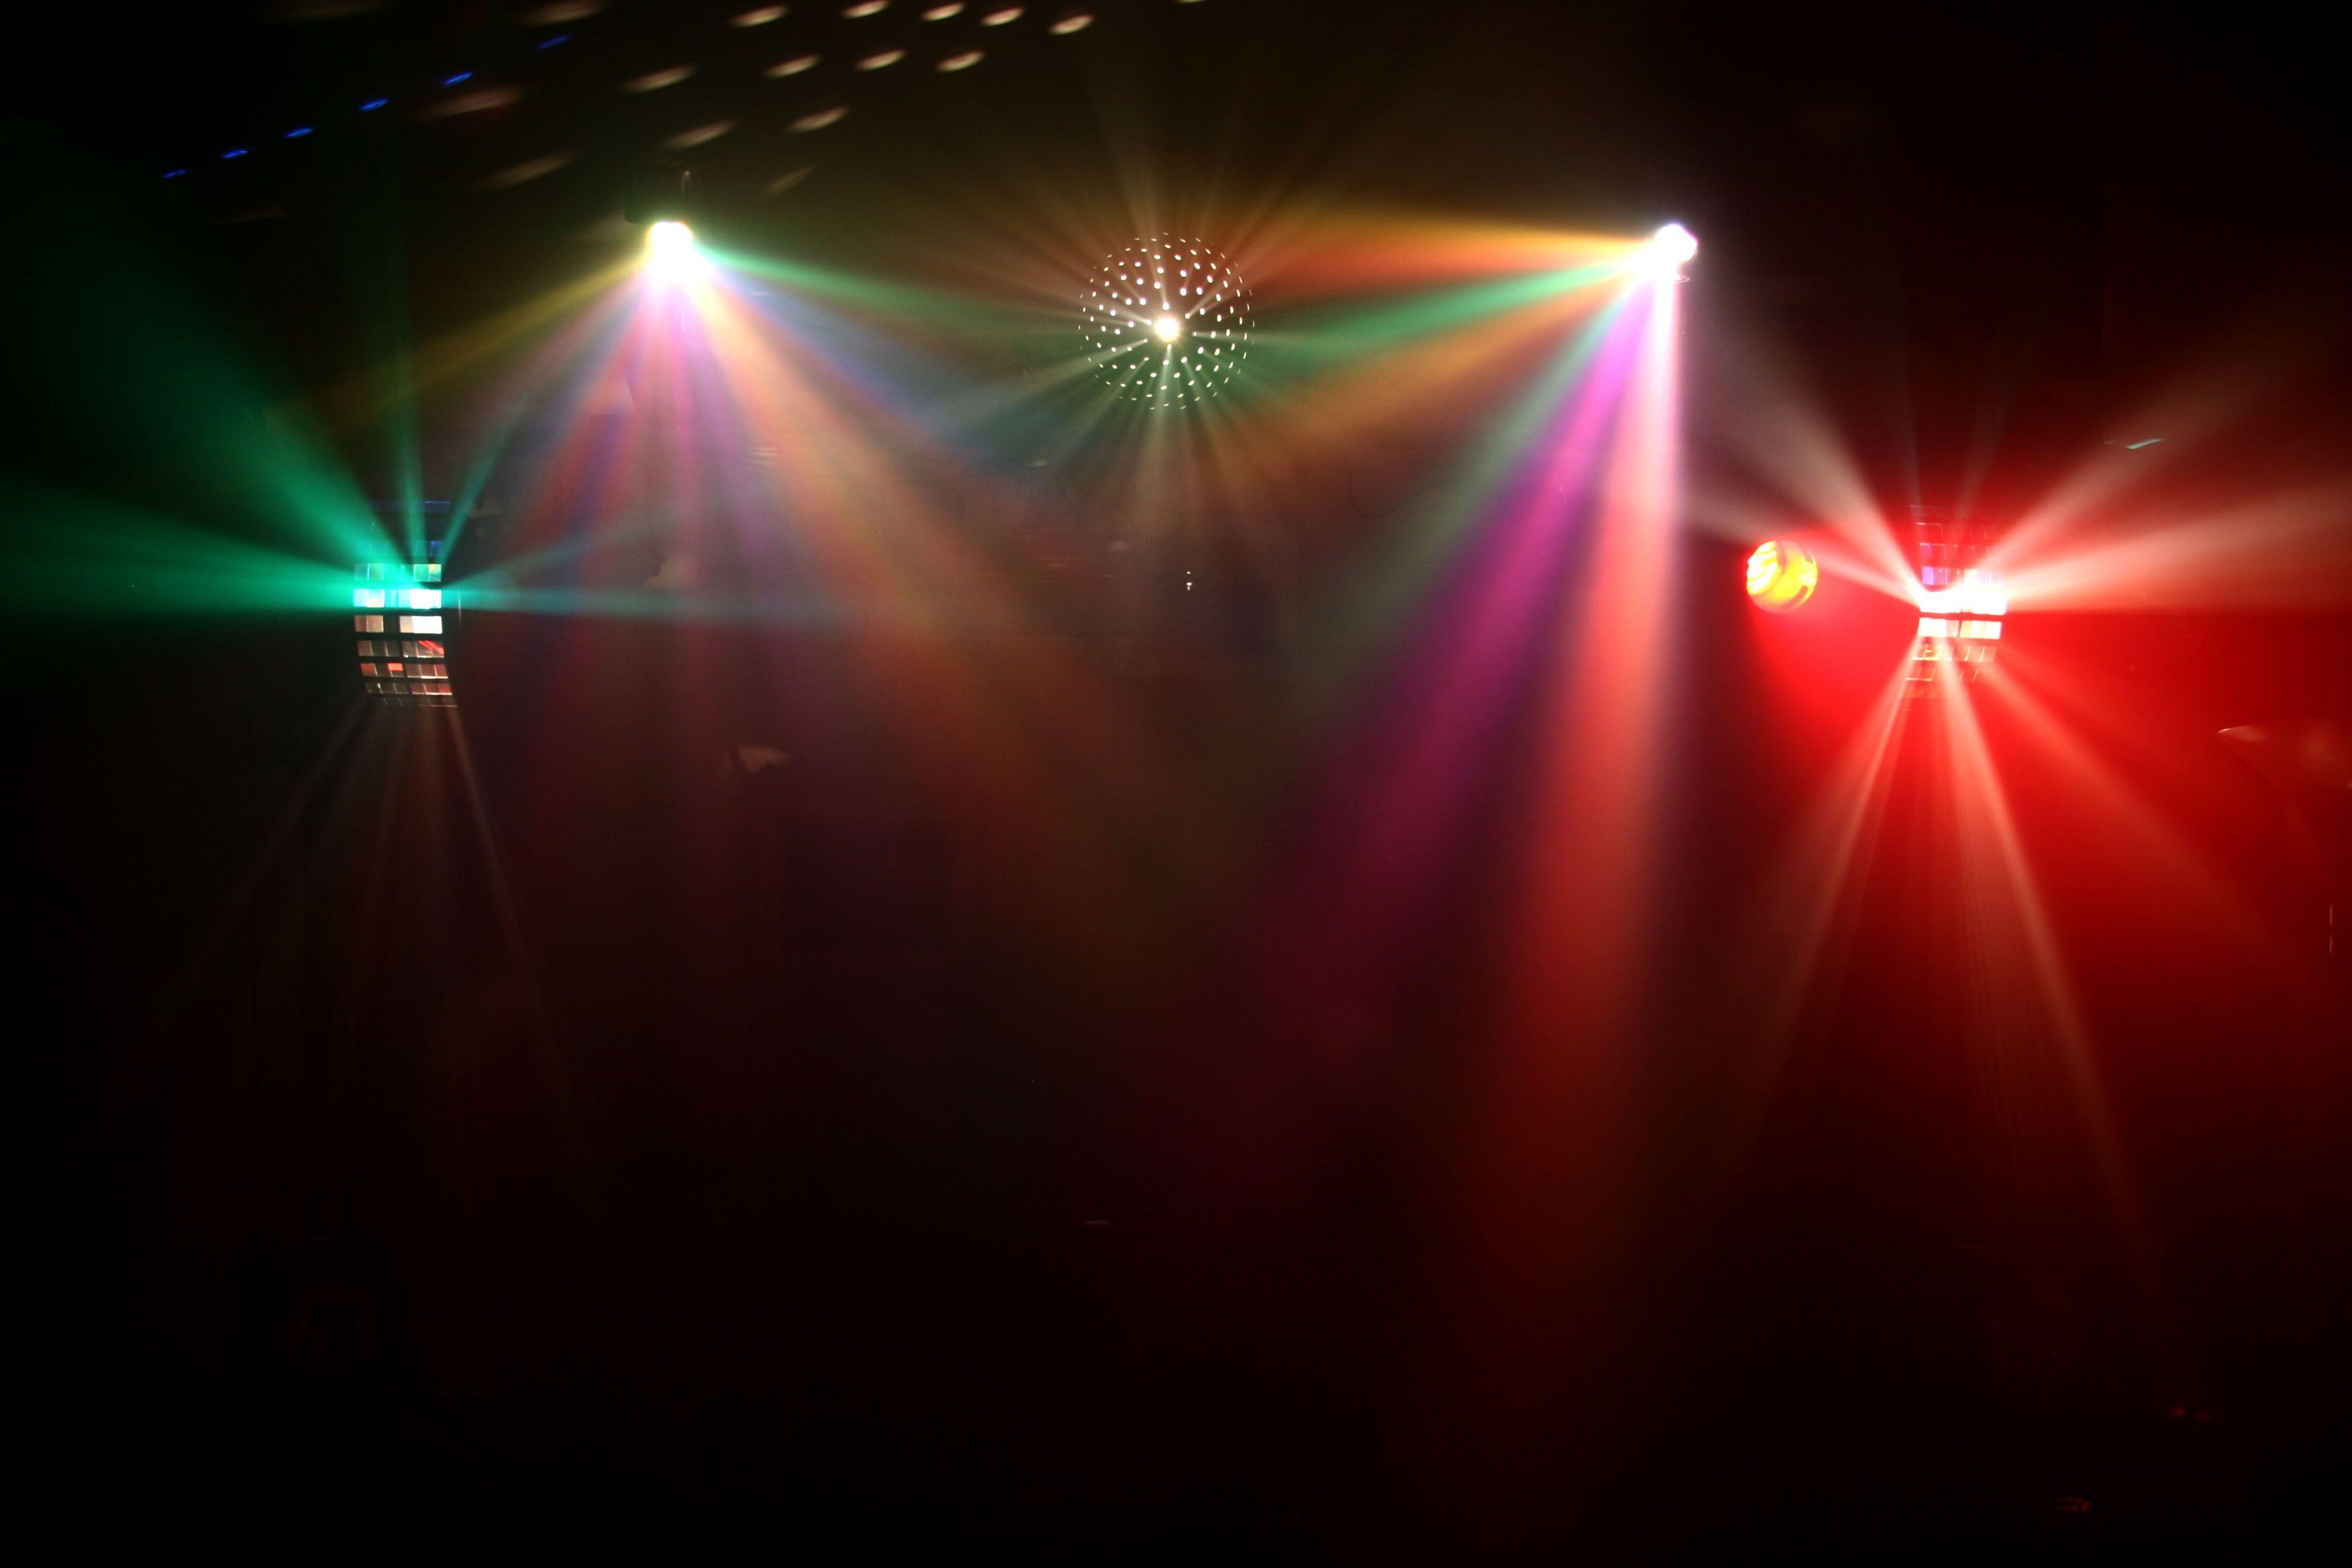 Led dj lights wallpapers wallpaper cave - Club lights wallpaper ...